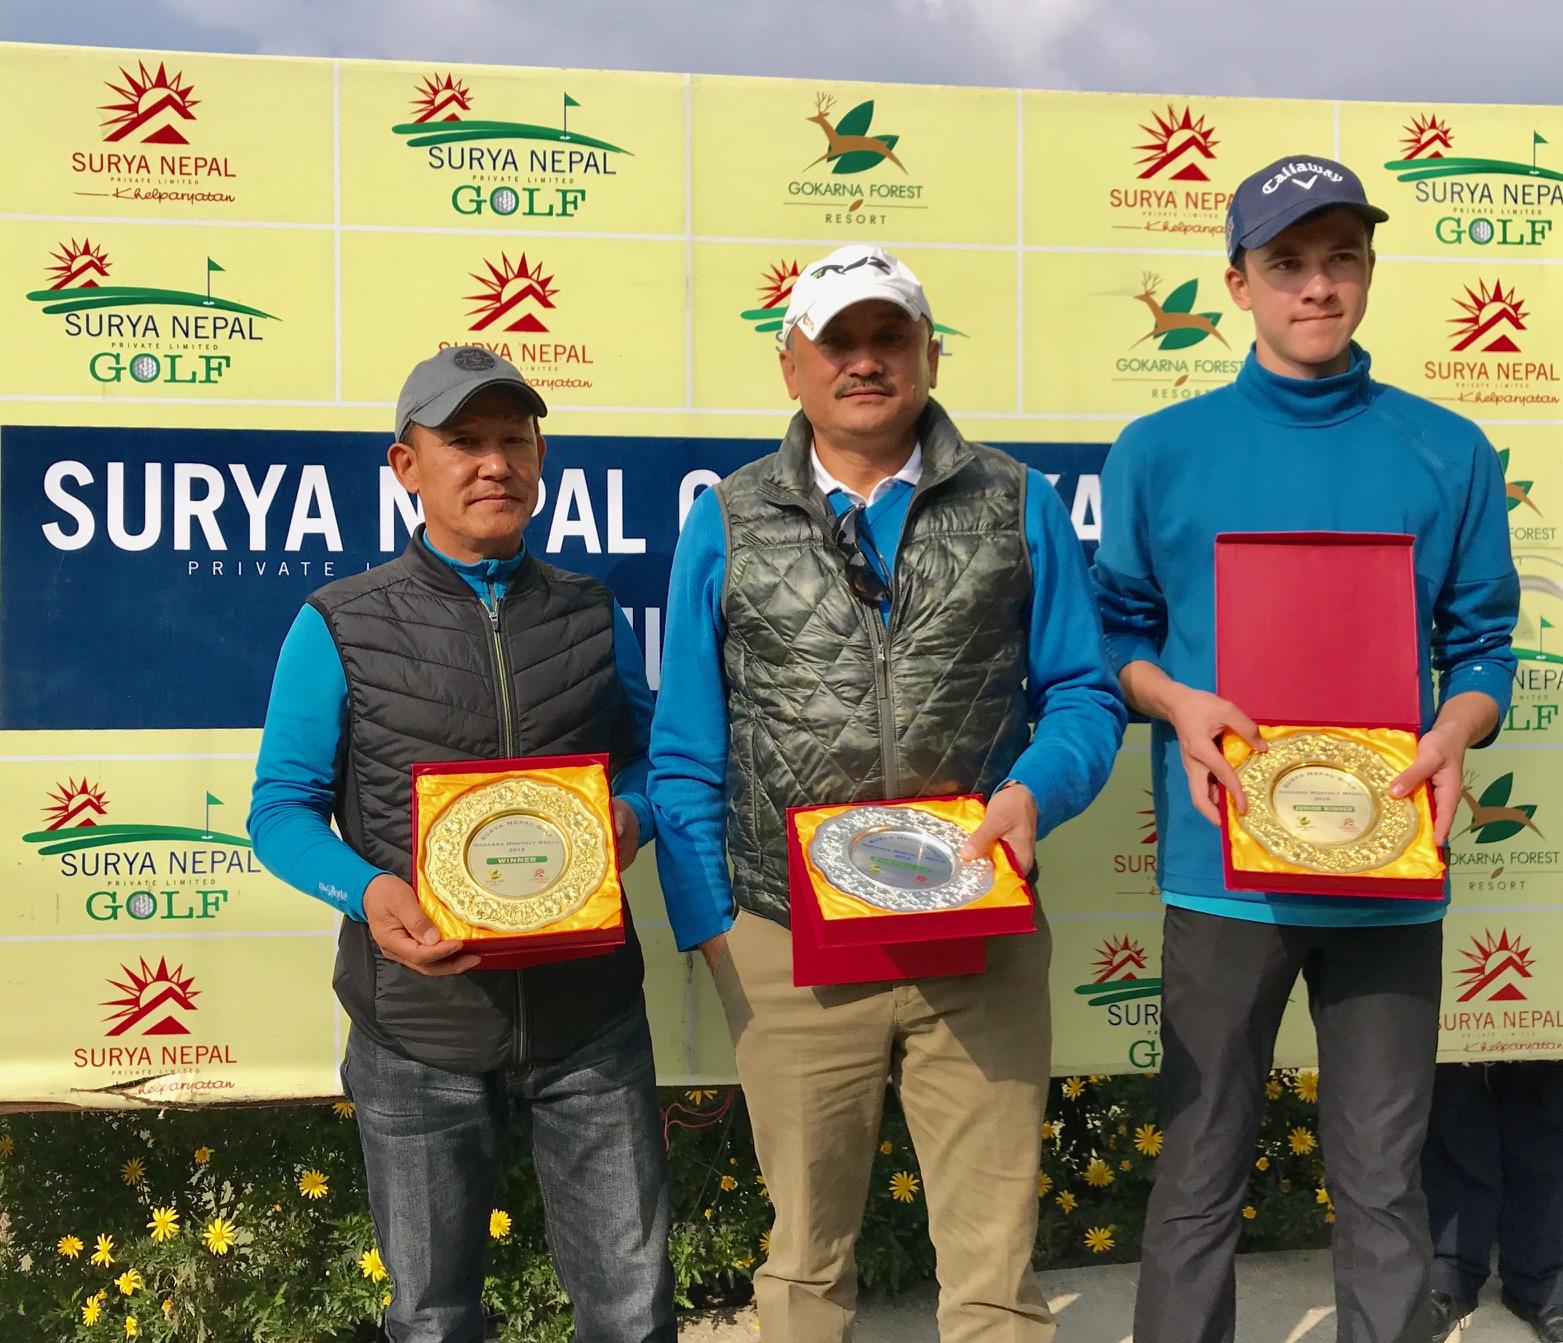 (From left) Ang Dorjee Sherpa, Pradeep Kumar Shrestha and Sam Doublard hold their trophies after the Surya Nepal Gokarna Monthly Medal here at the Gokarna Golf Club in Kathmandu on Saturday, December 8, 2018. Photo: THT